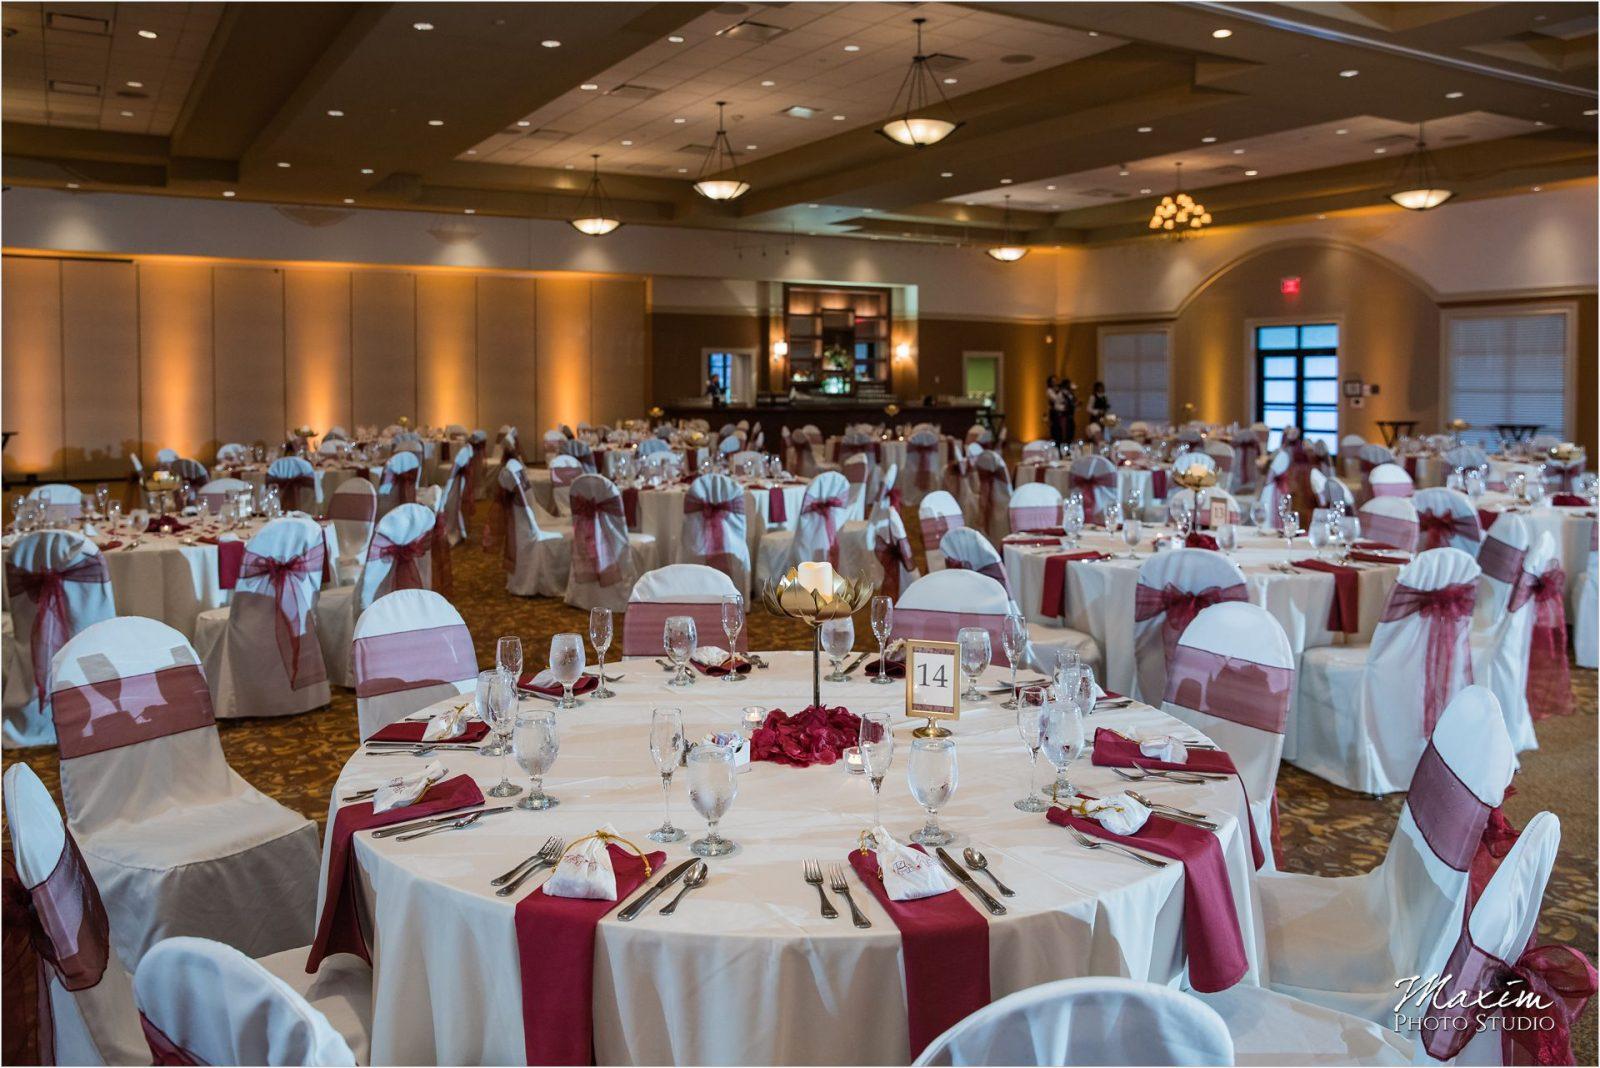 Savannah Center Cincinnati Indian Wedding Reception Decor